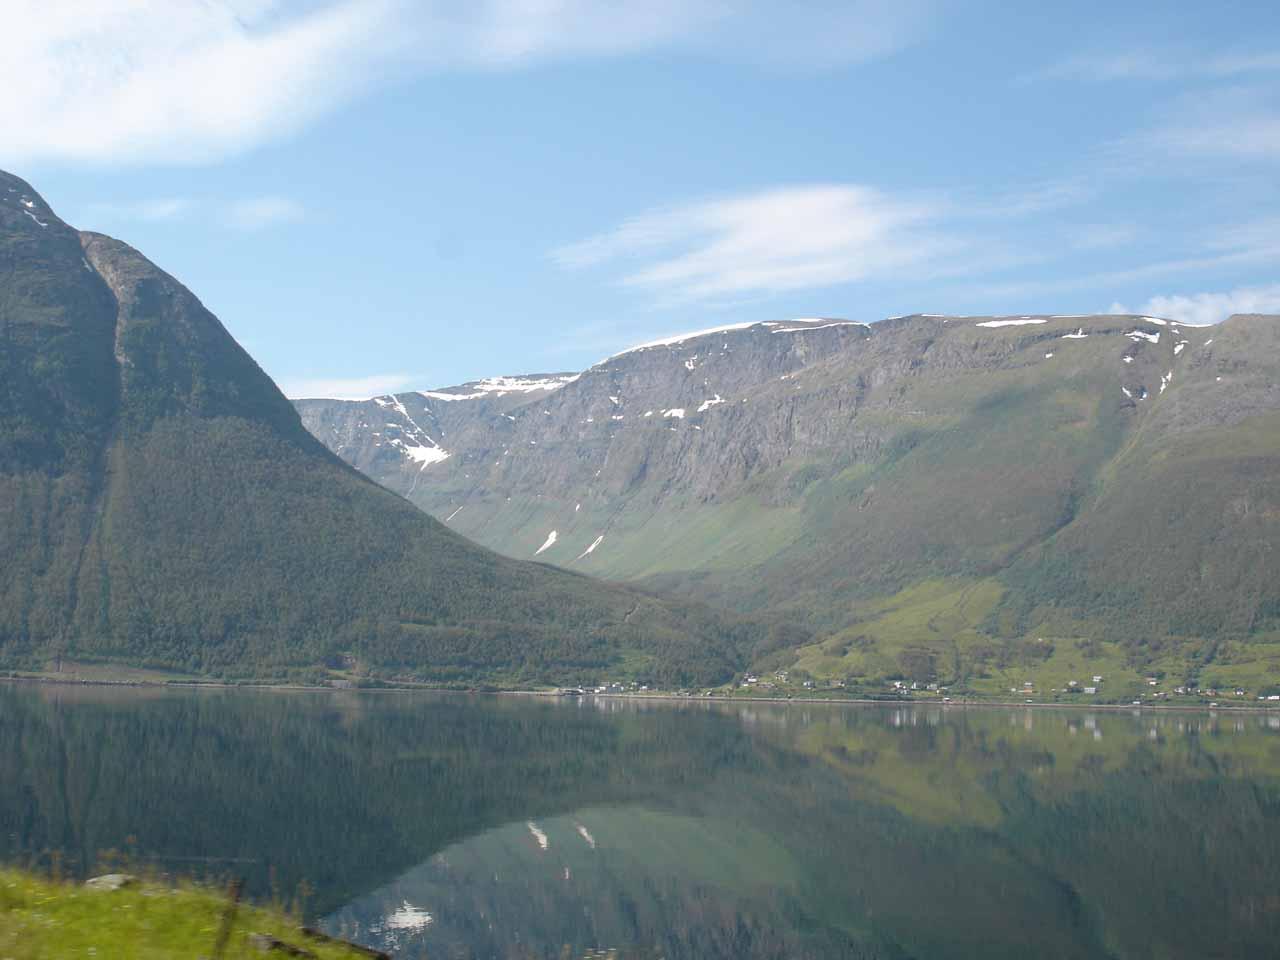 Looking across Kåfjorden towards the hamlet and valley of Skarvdalen